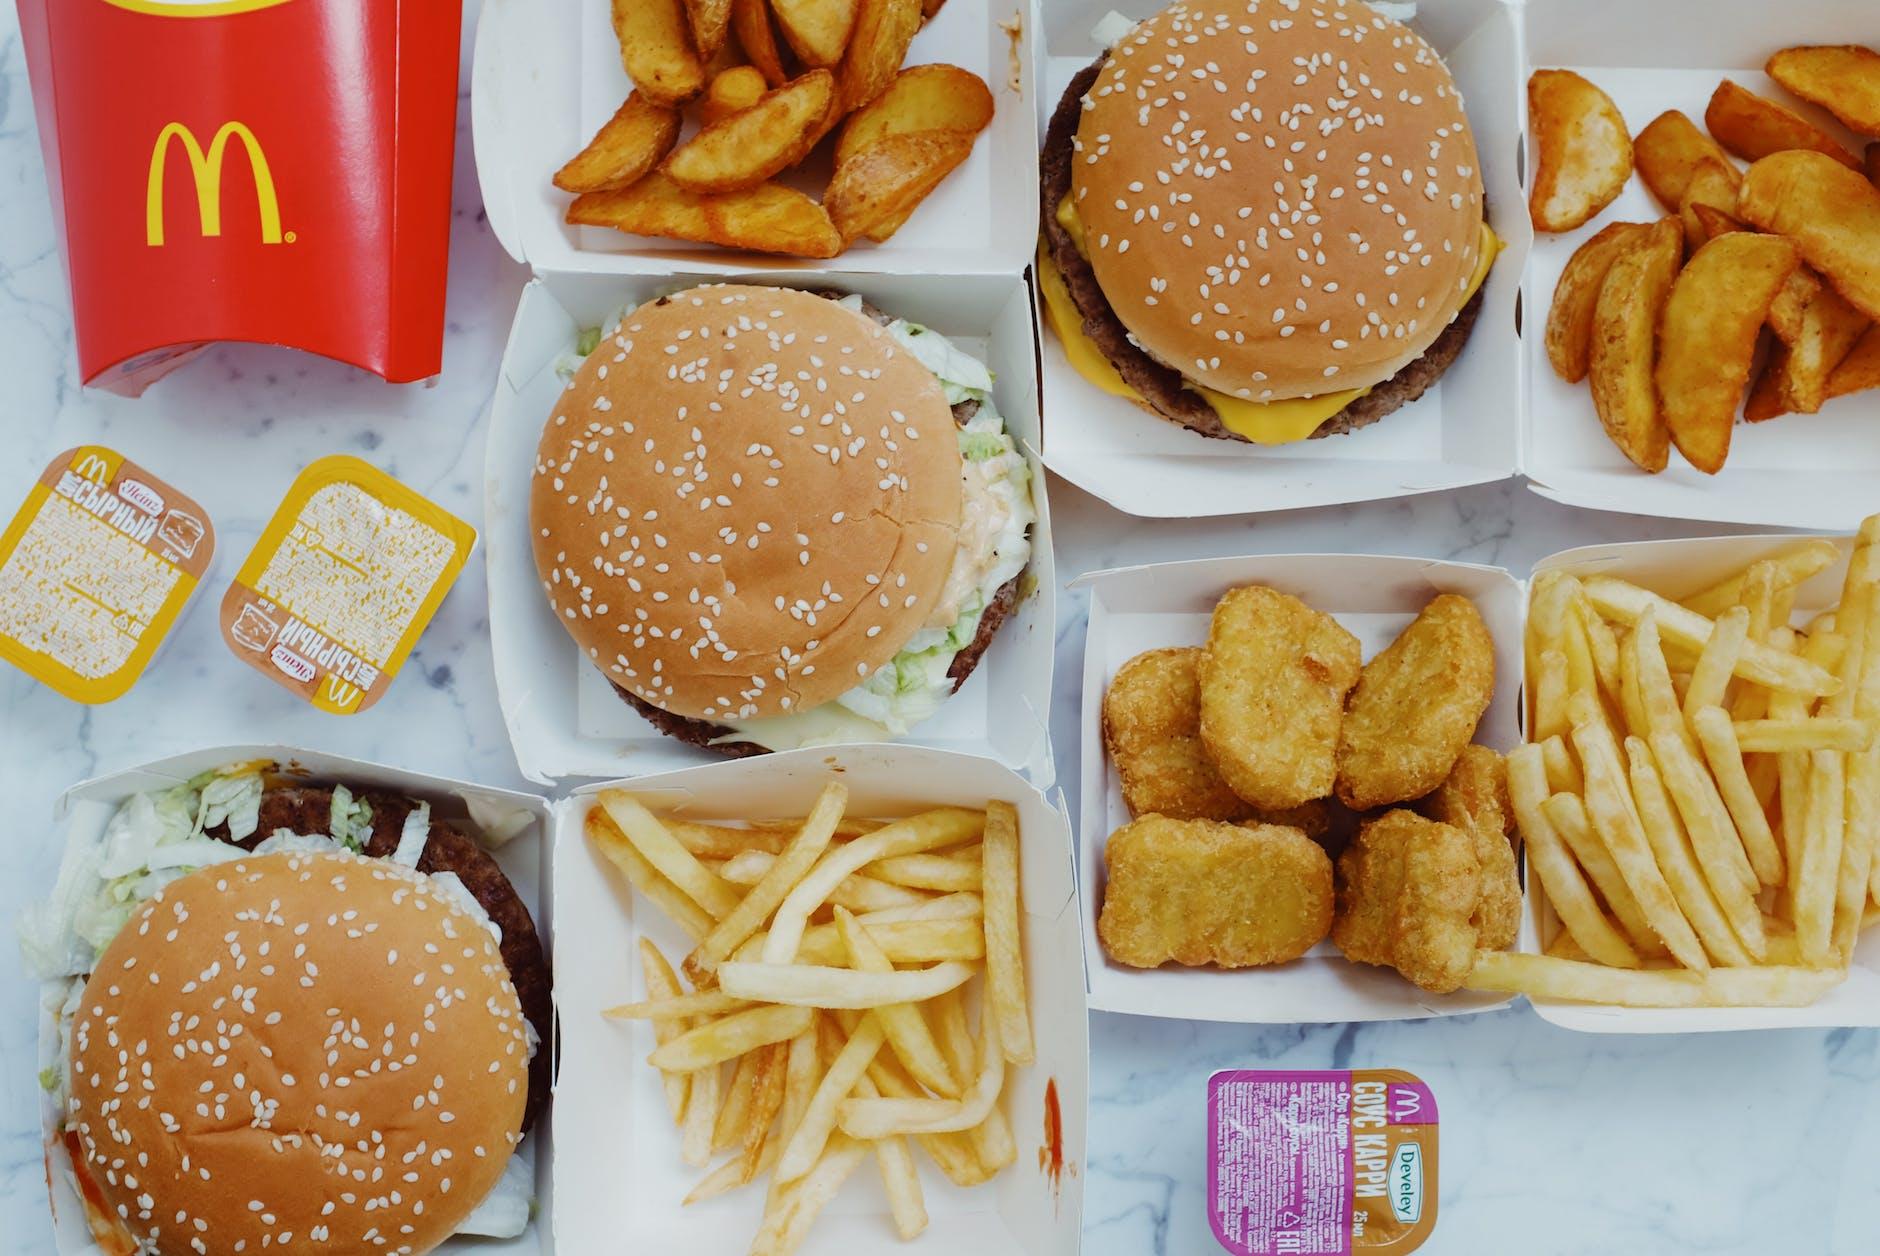 McDonald's Lunch Menu